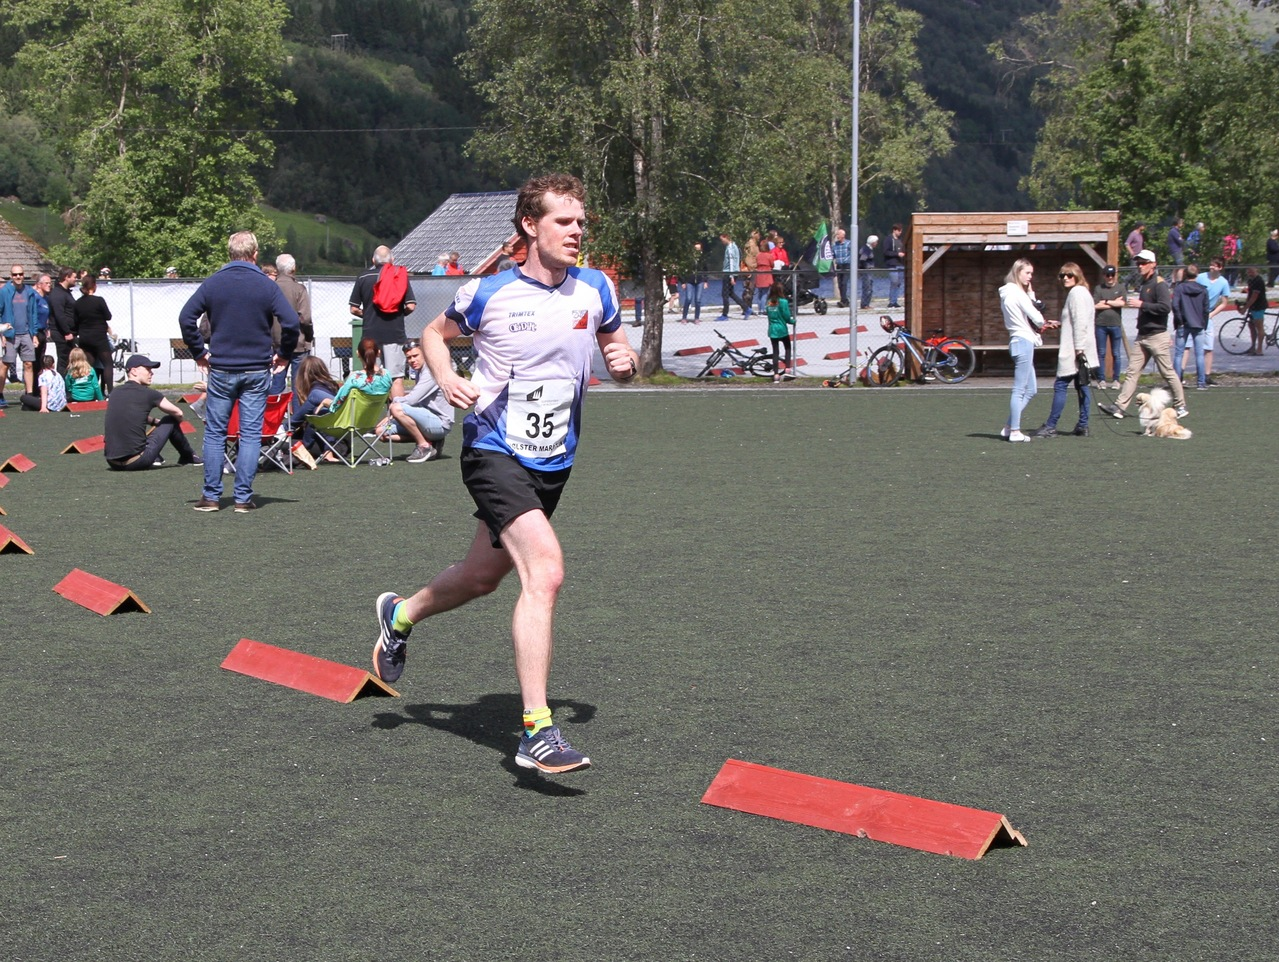 Tor_Andreas_Andersen_3maraton